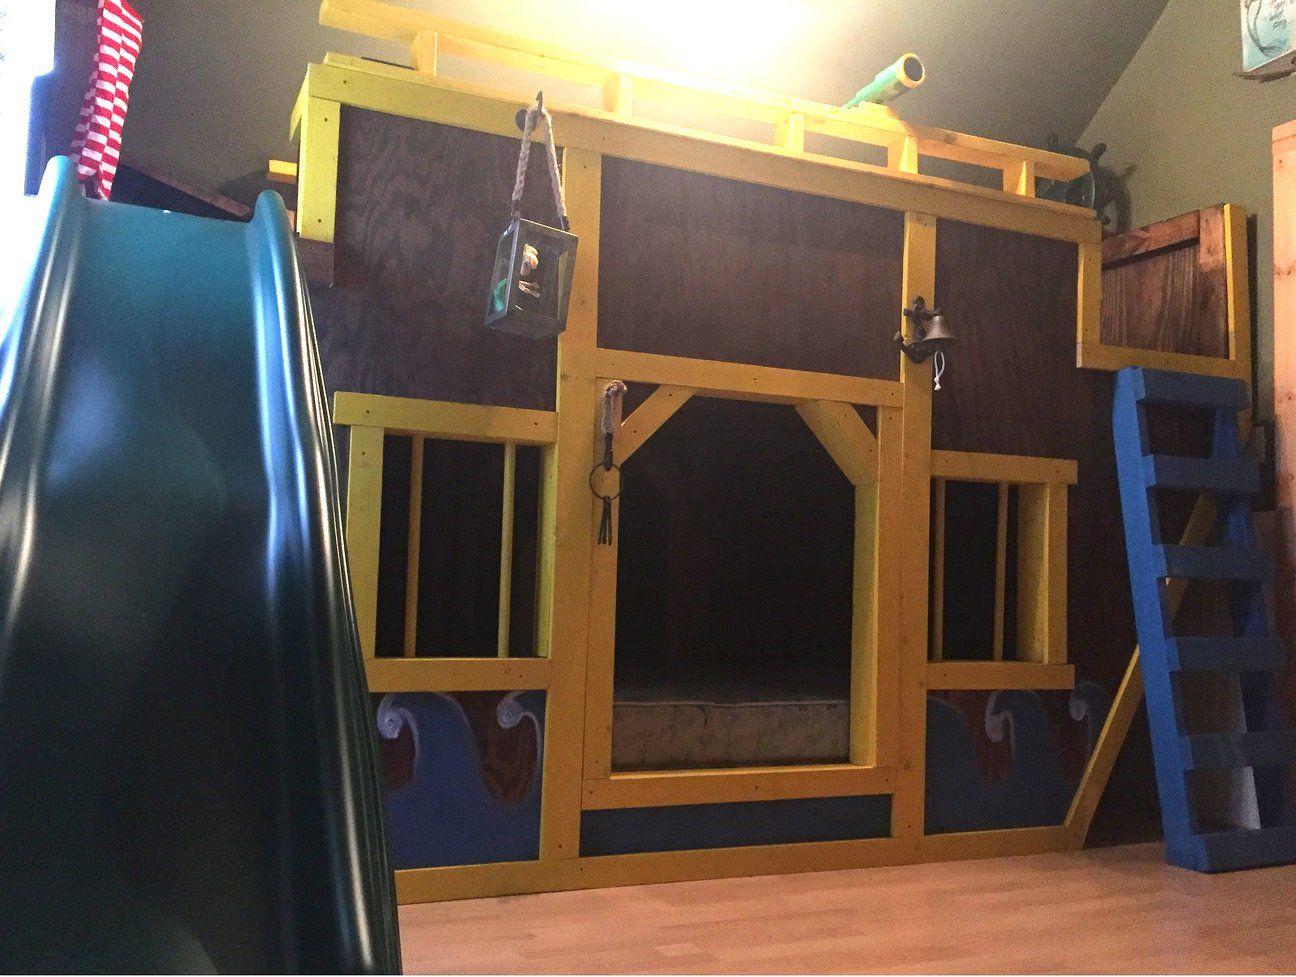 Sea King Pirateship Bunk Bed Plan Bunk beds, Bed plans